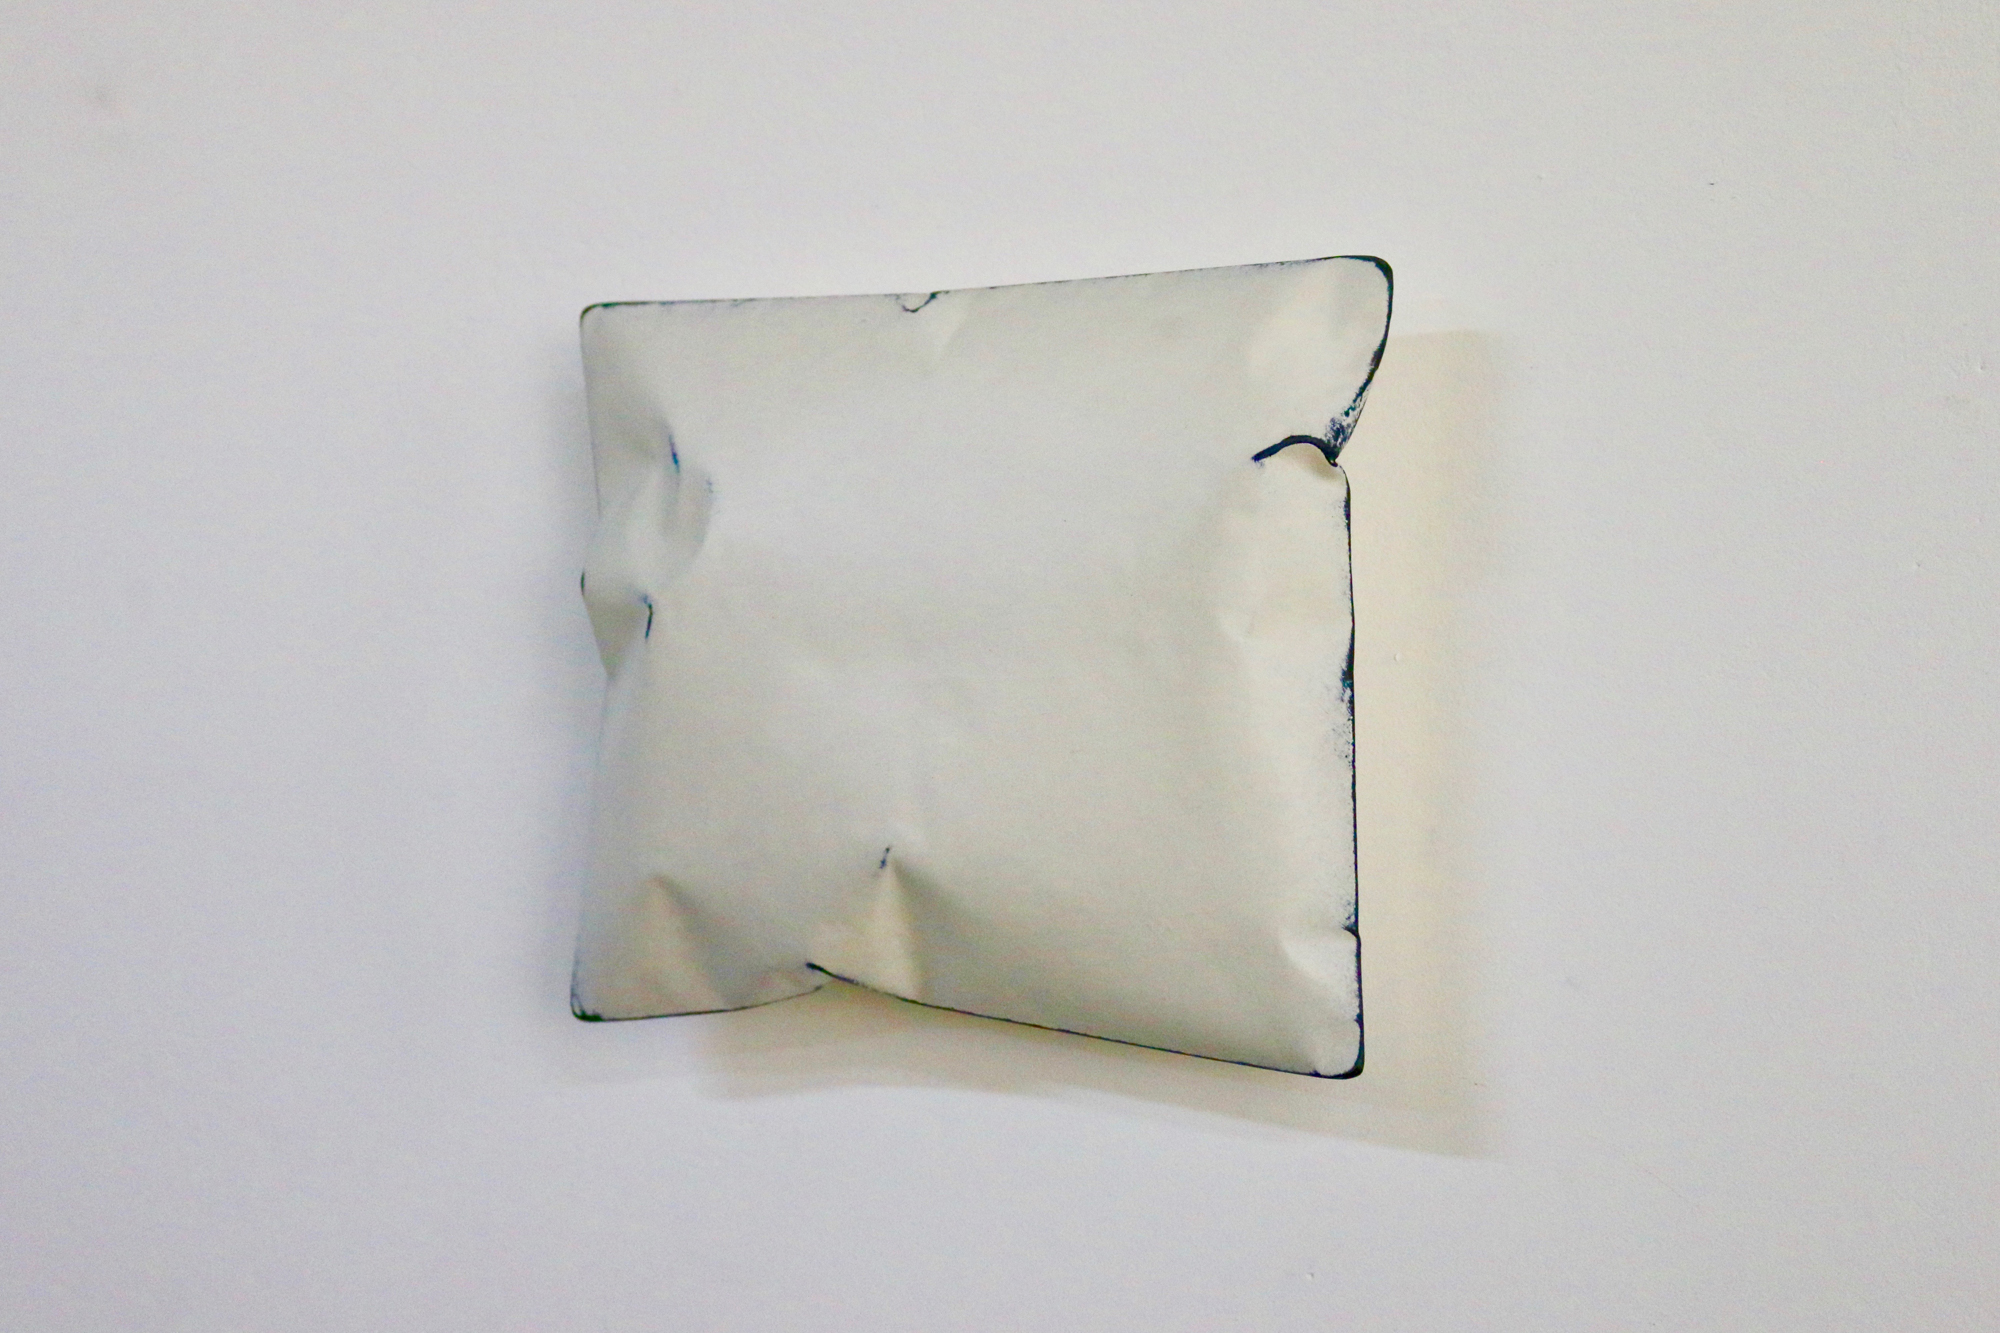 Johan De Wit, Untitled, 2018, Paper, Resin, Marble, Acrylic, 24 x 20 x 6.5, Affinity Art